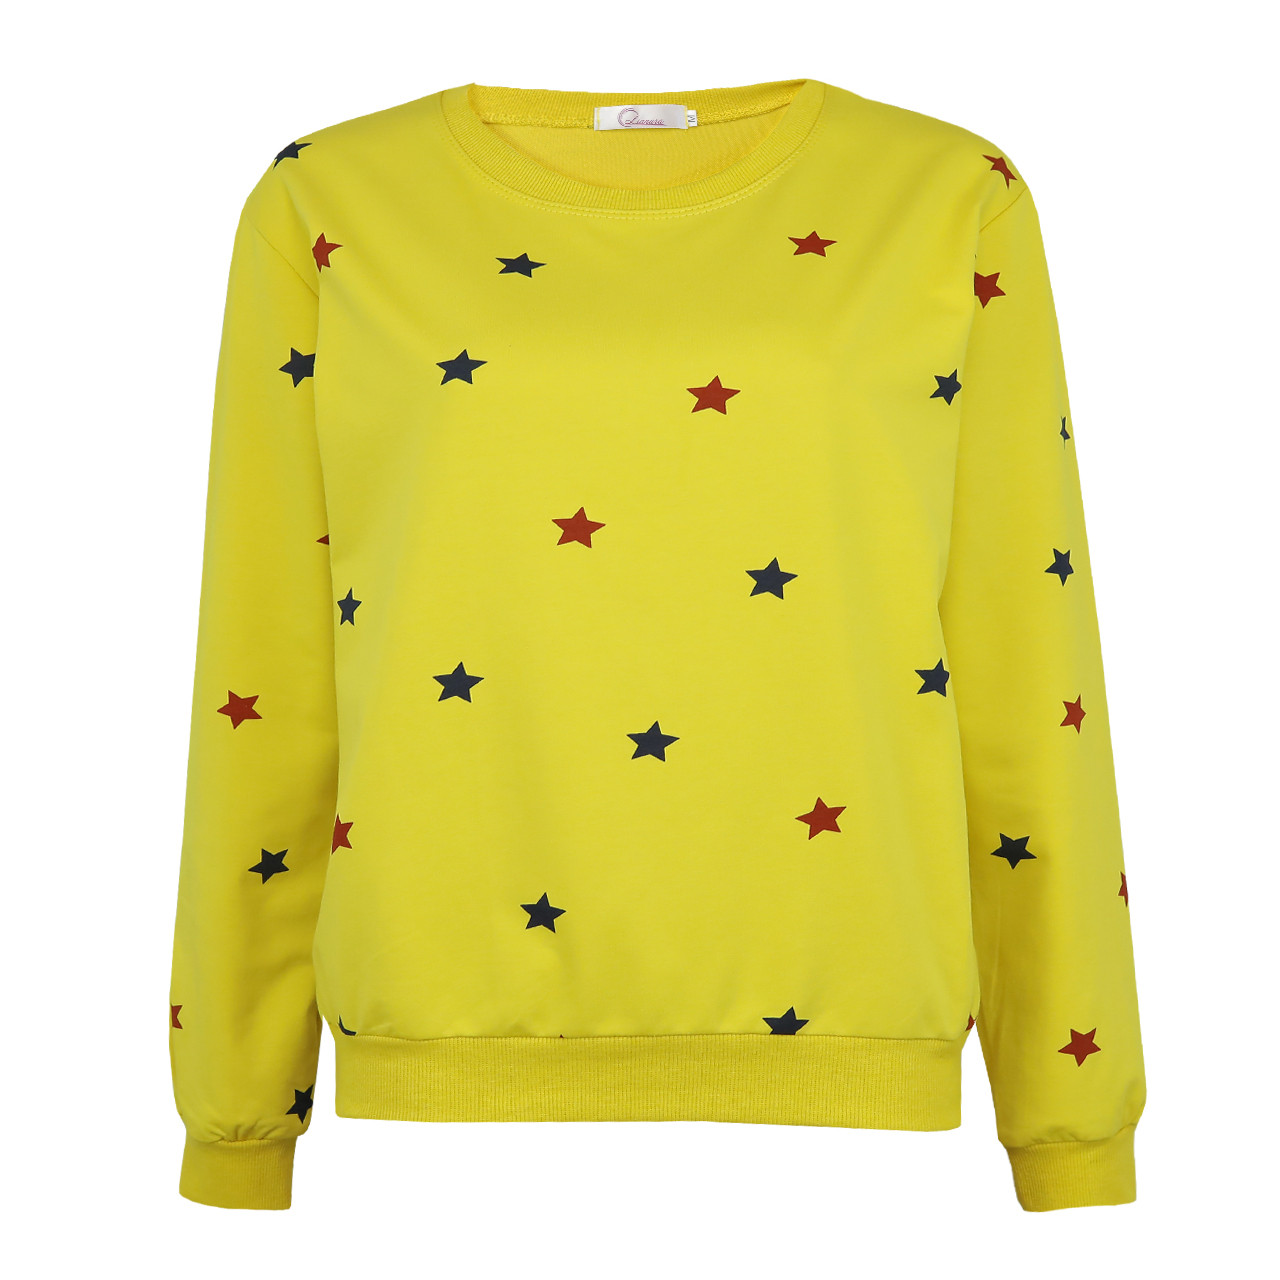 Кофта женская желтая, молодежный свитшот Lianara